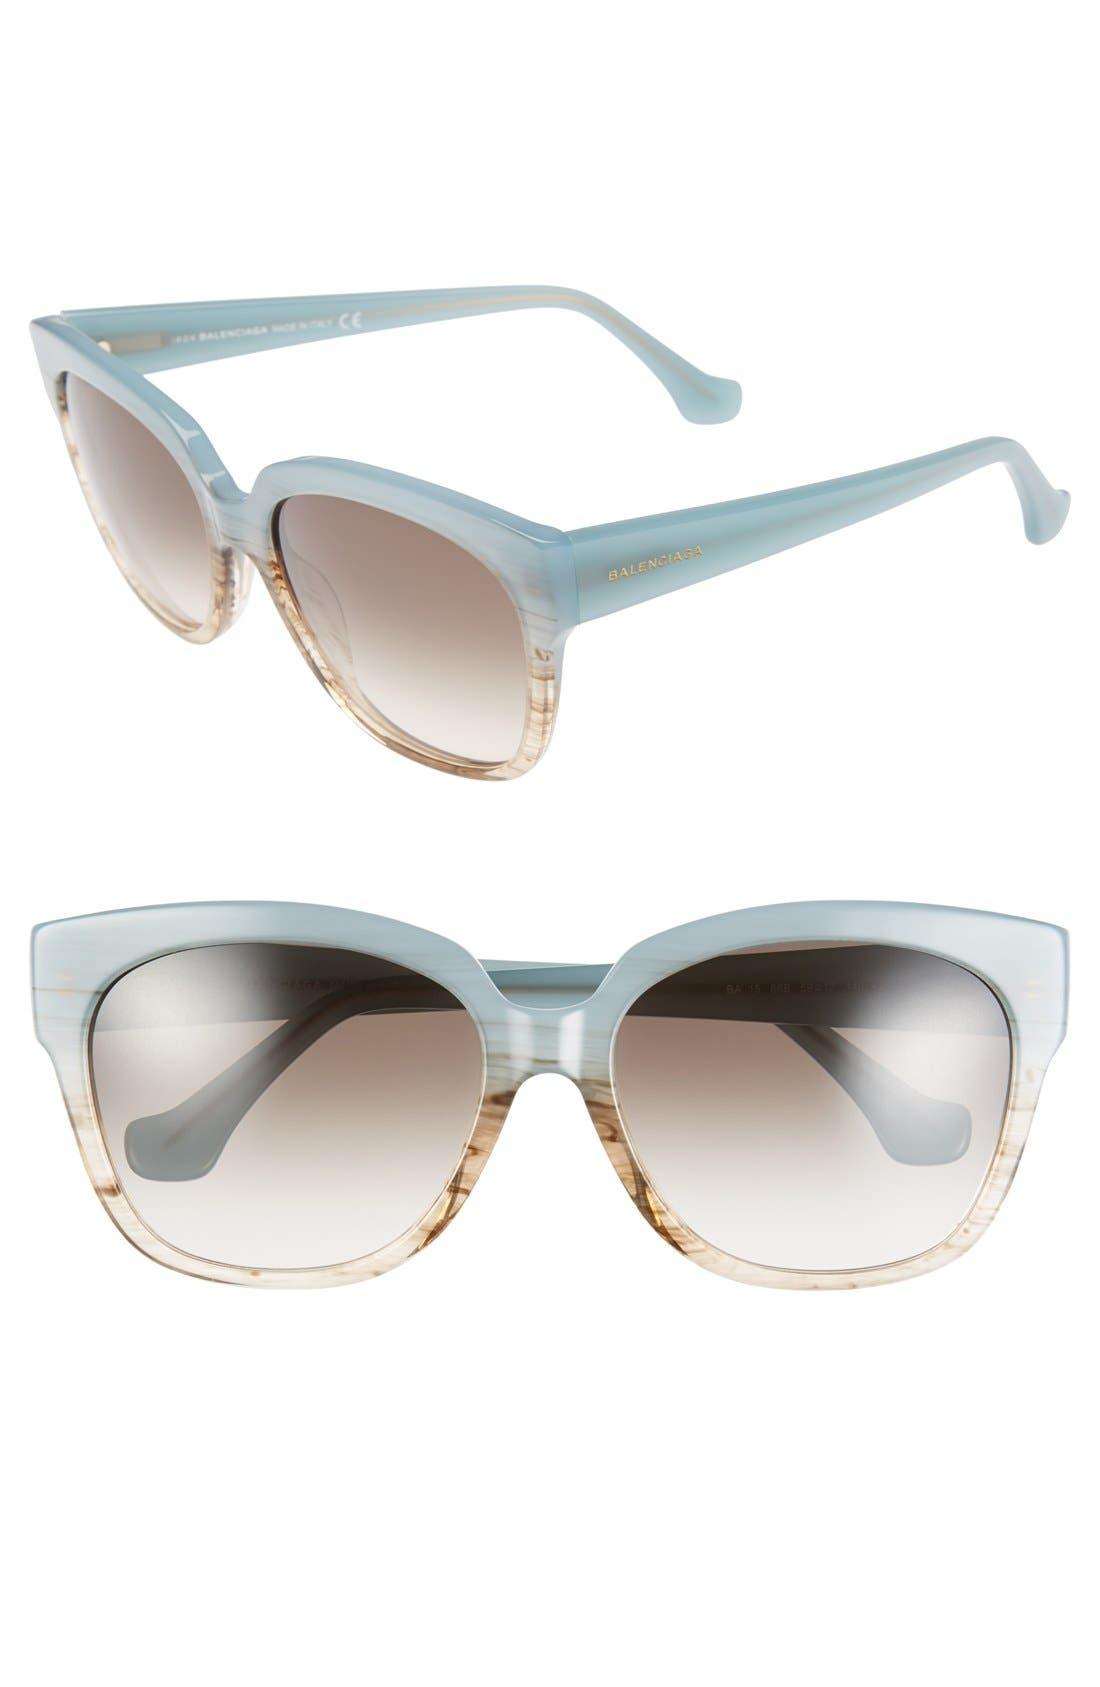 Main Image - Balenciaga Paris 59mm 'BA0015' Sunglasses